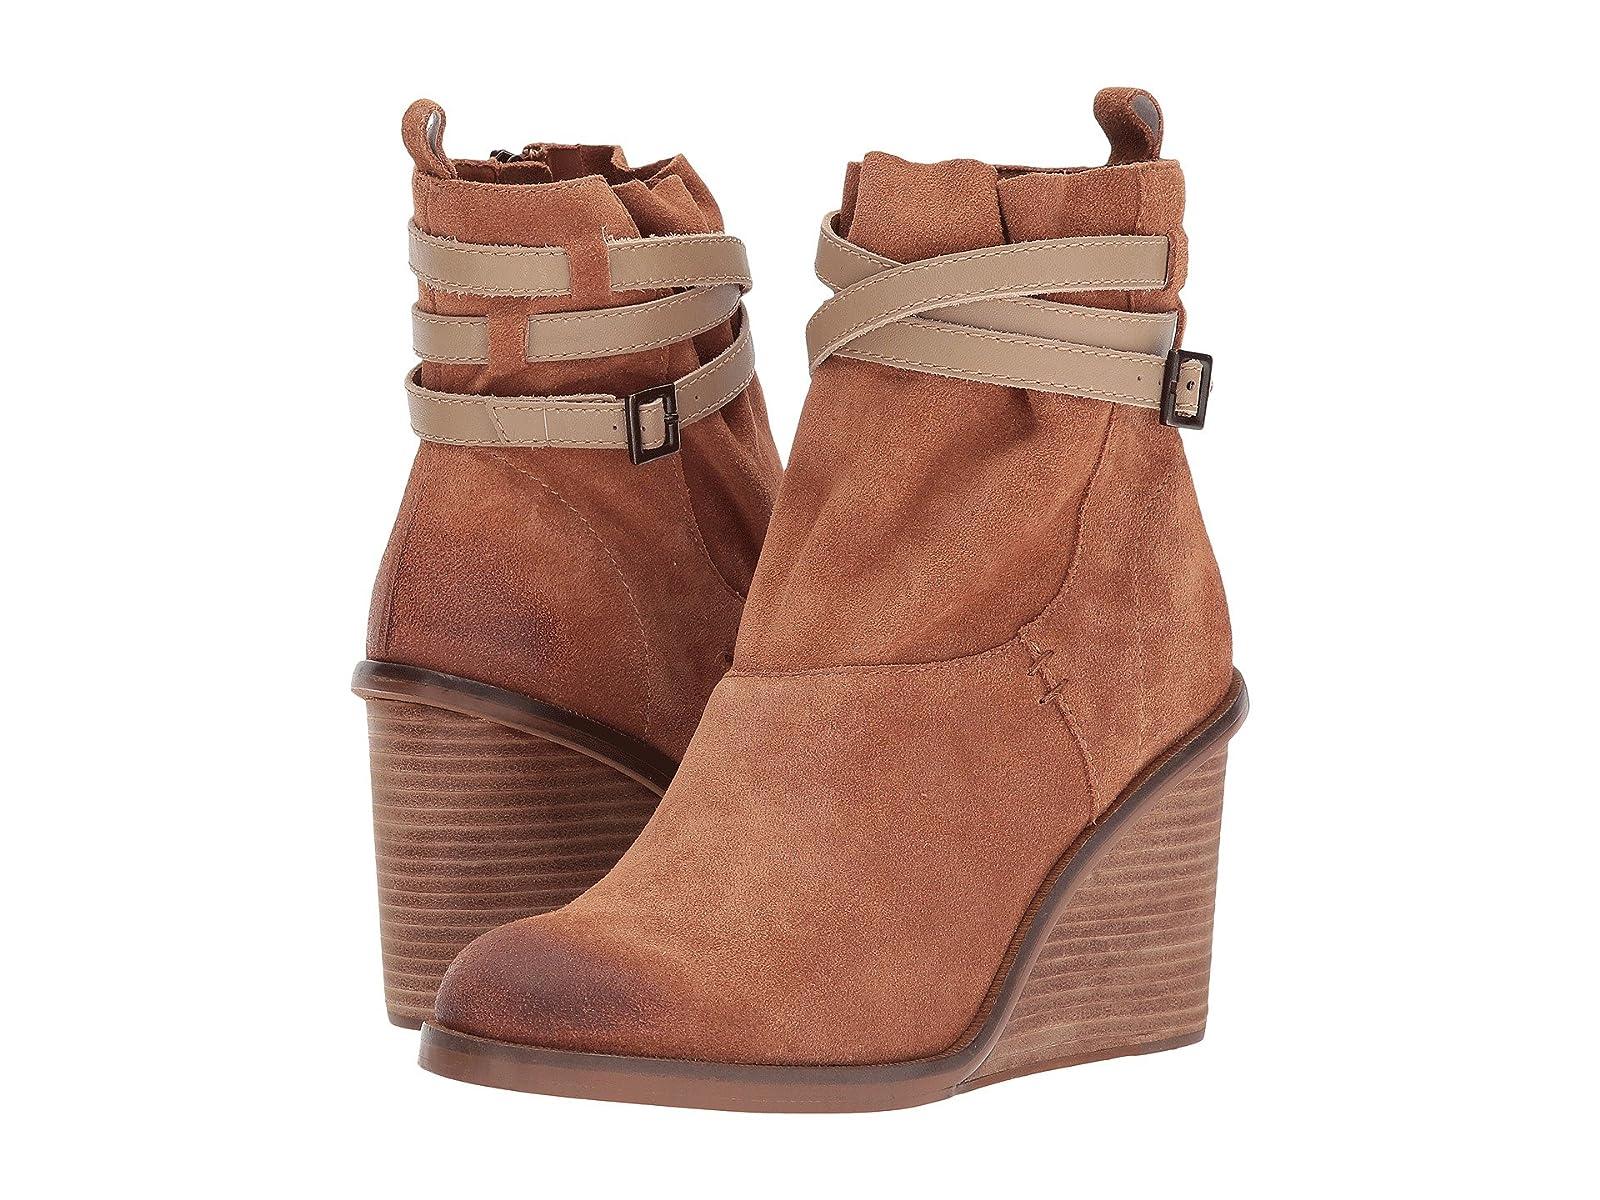 Kelsi Dagger Brooklyn PhoenixCheap and distinctive eye-catching shoes